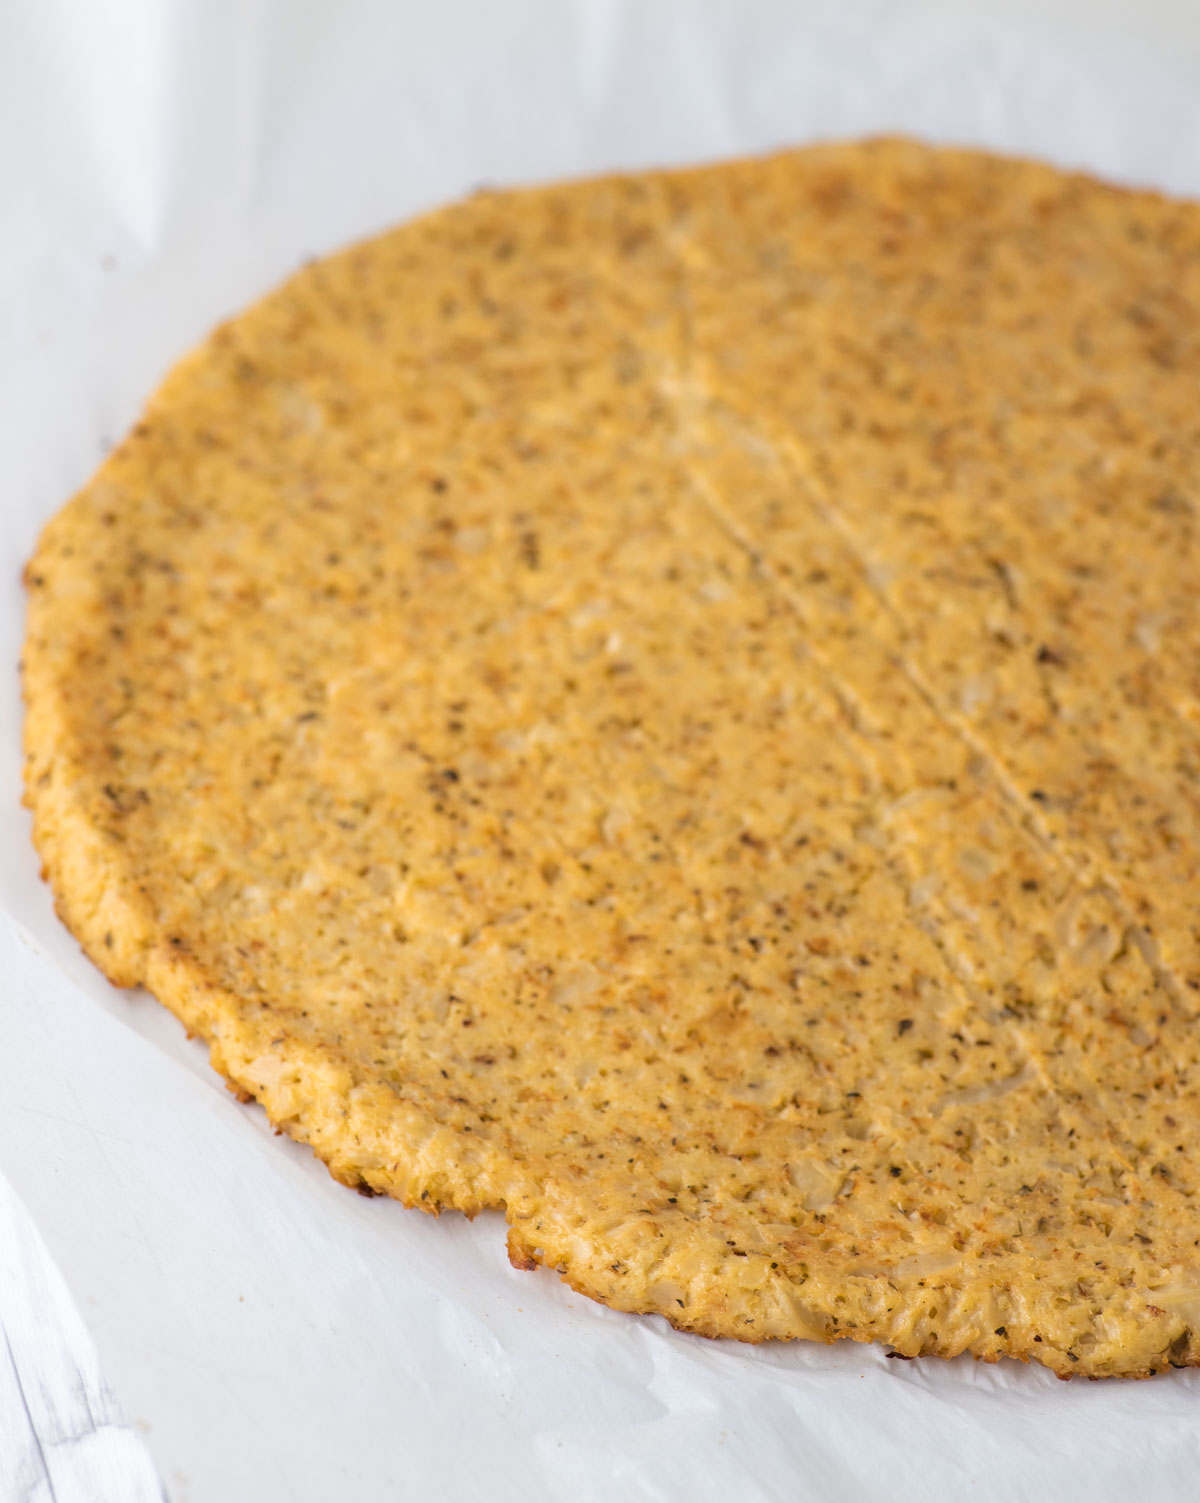 cauliflower crust on parchment paper